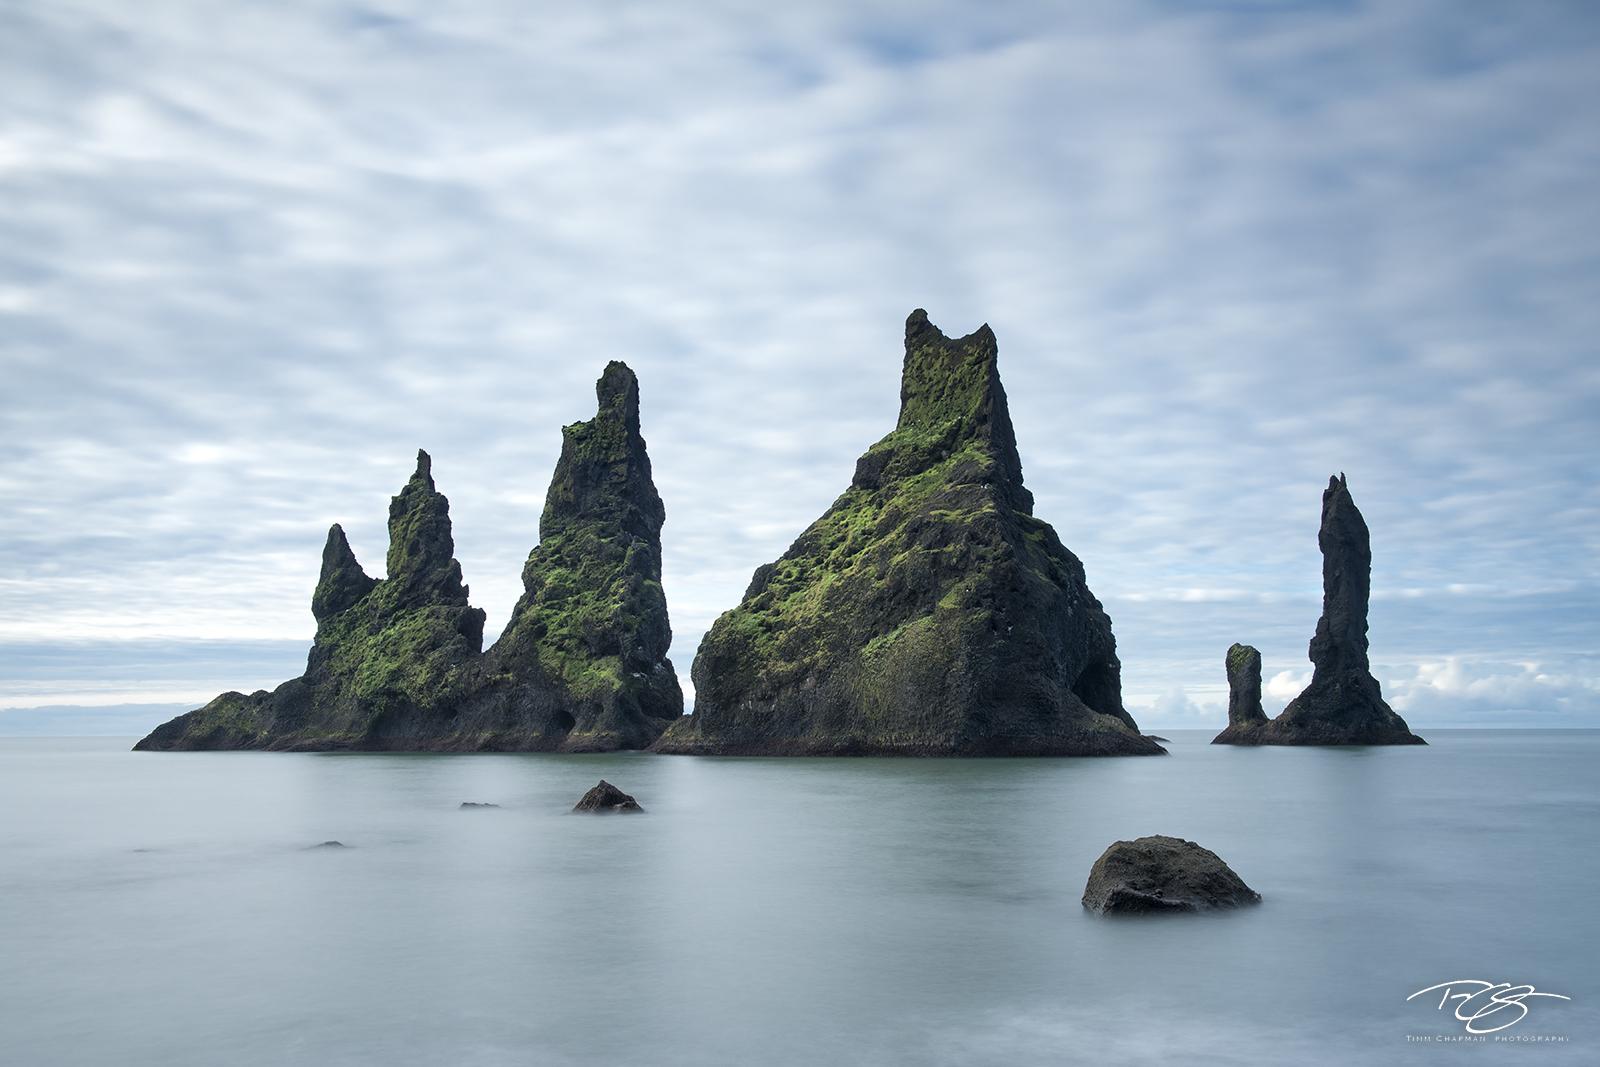 iceland, trolls, troll, reynisdrangar, icelandic trolls, icelandic troll, vik, myrdal, reynisfjara, sea stacks, sea stack, rock formations, rocks, rugged landscape, moss, basalt, photo